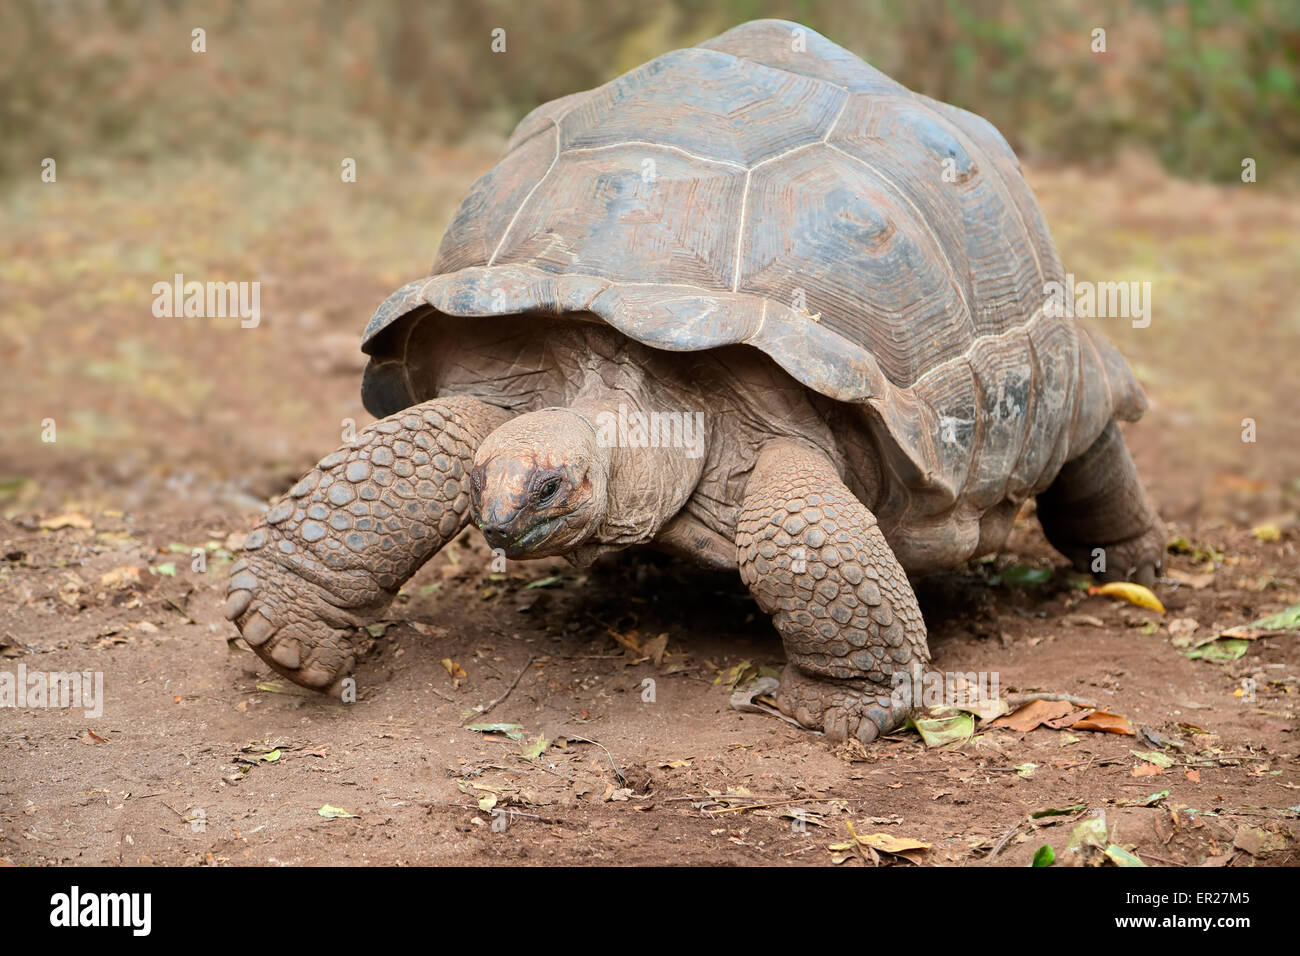 Aldabra giant tortoise (Aldabrachelys gigantea) on prison island, Zanzibar - Stock Image